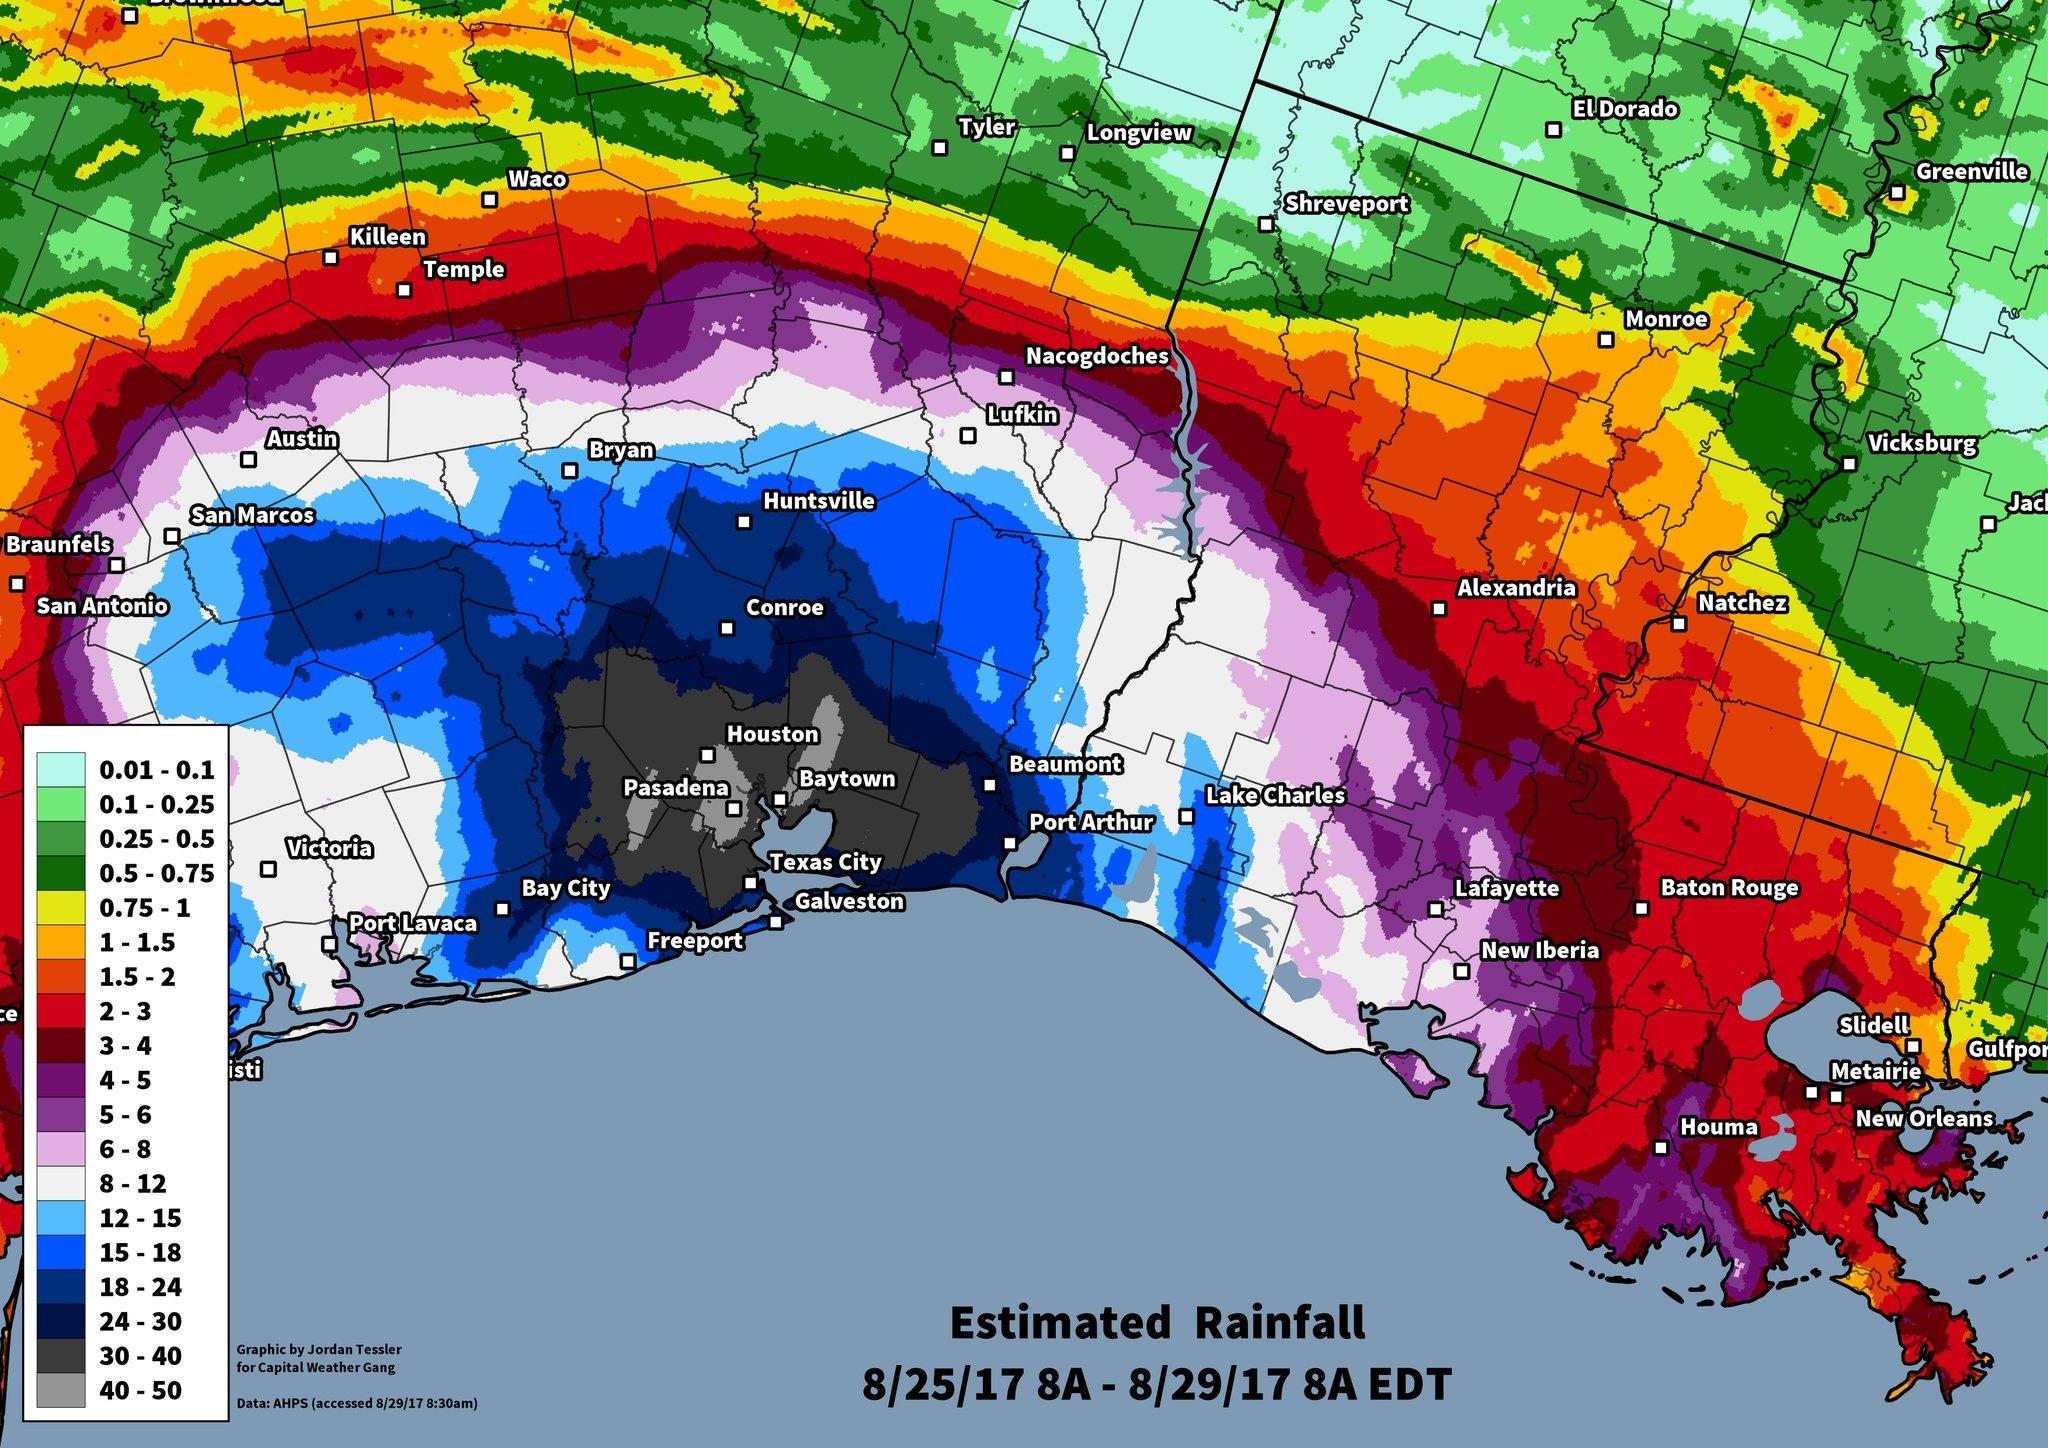 Harvey's estimated rains through Tuesday morning.